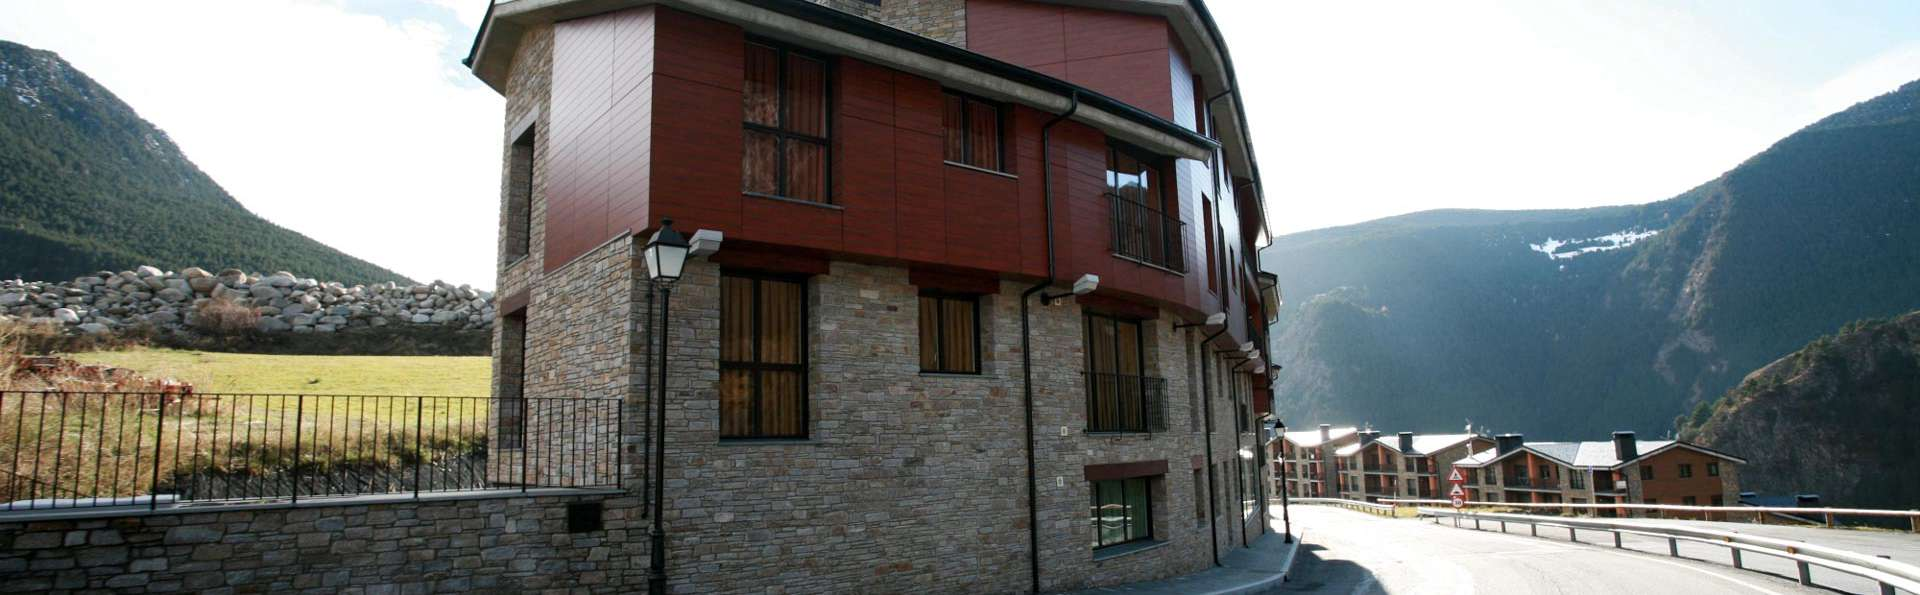 Hotel Obaga Blanca - EDIT_FRONT_22.jpg